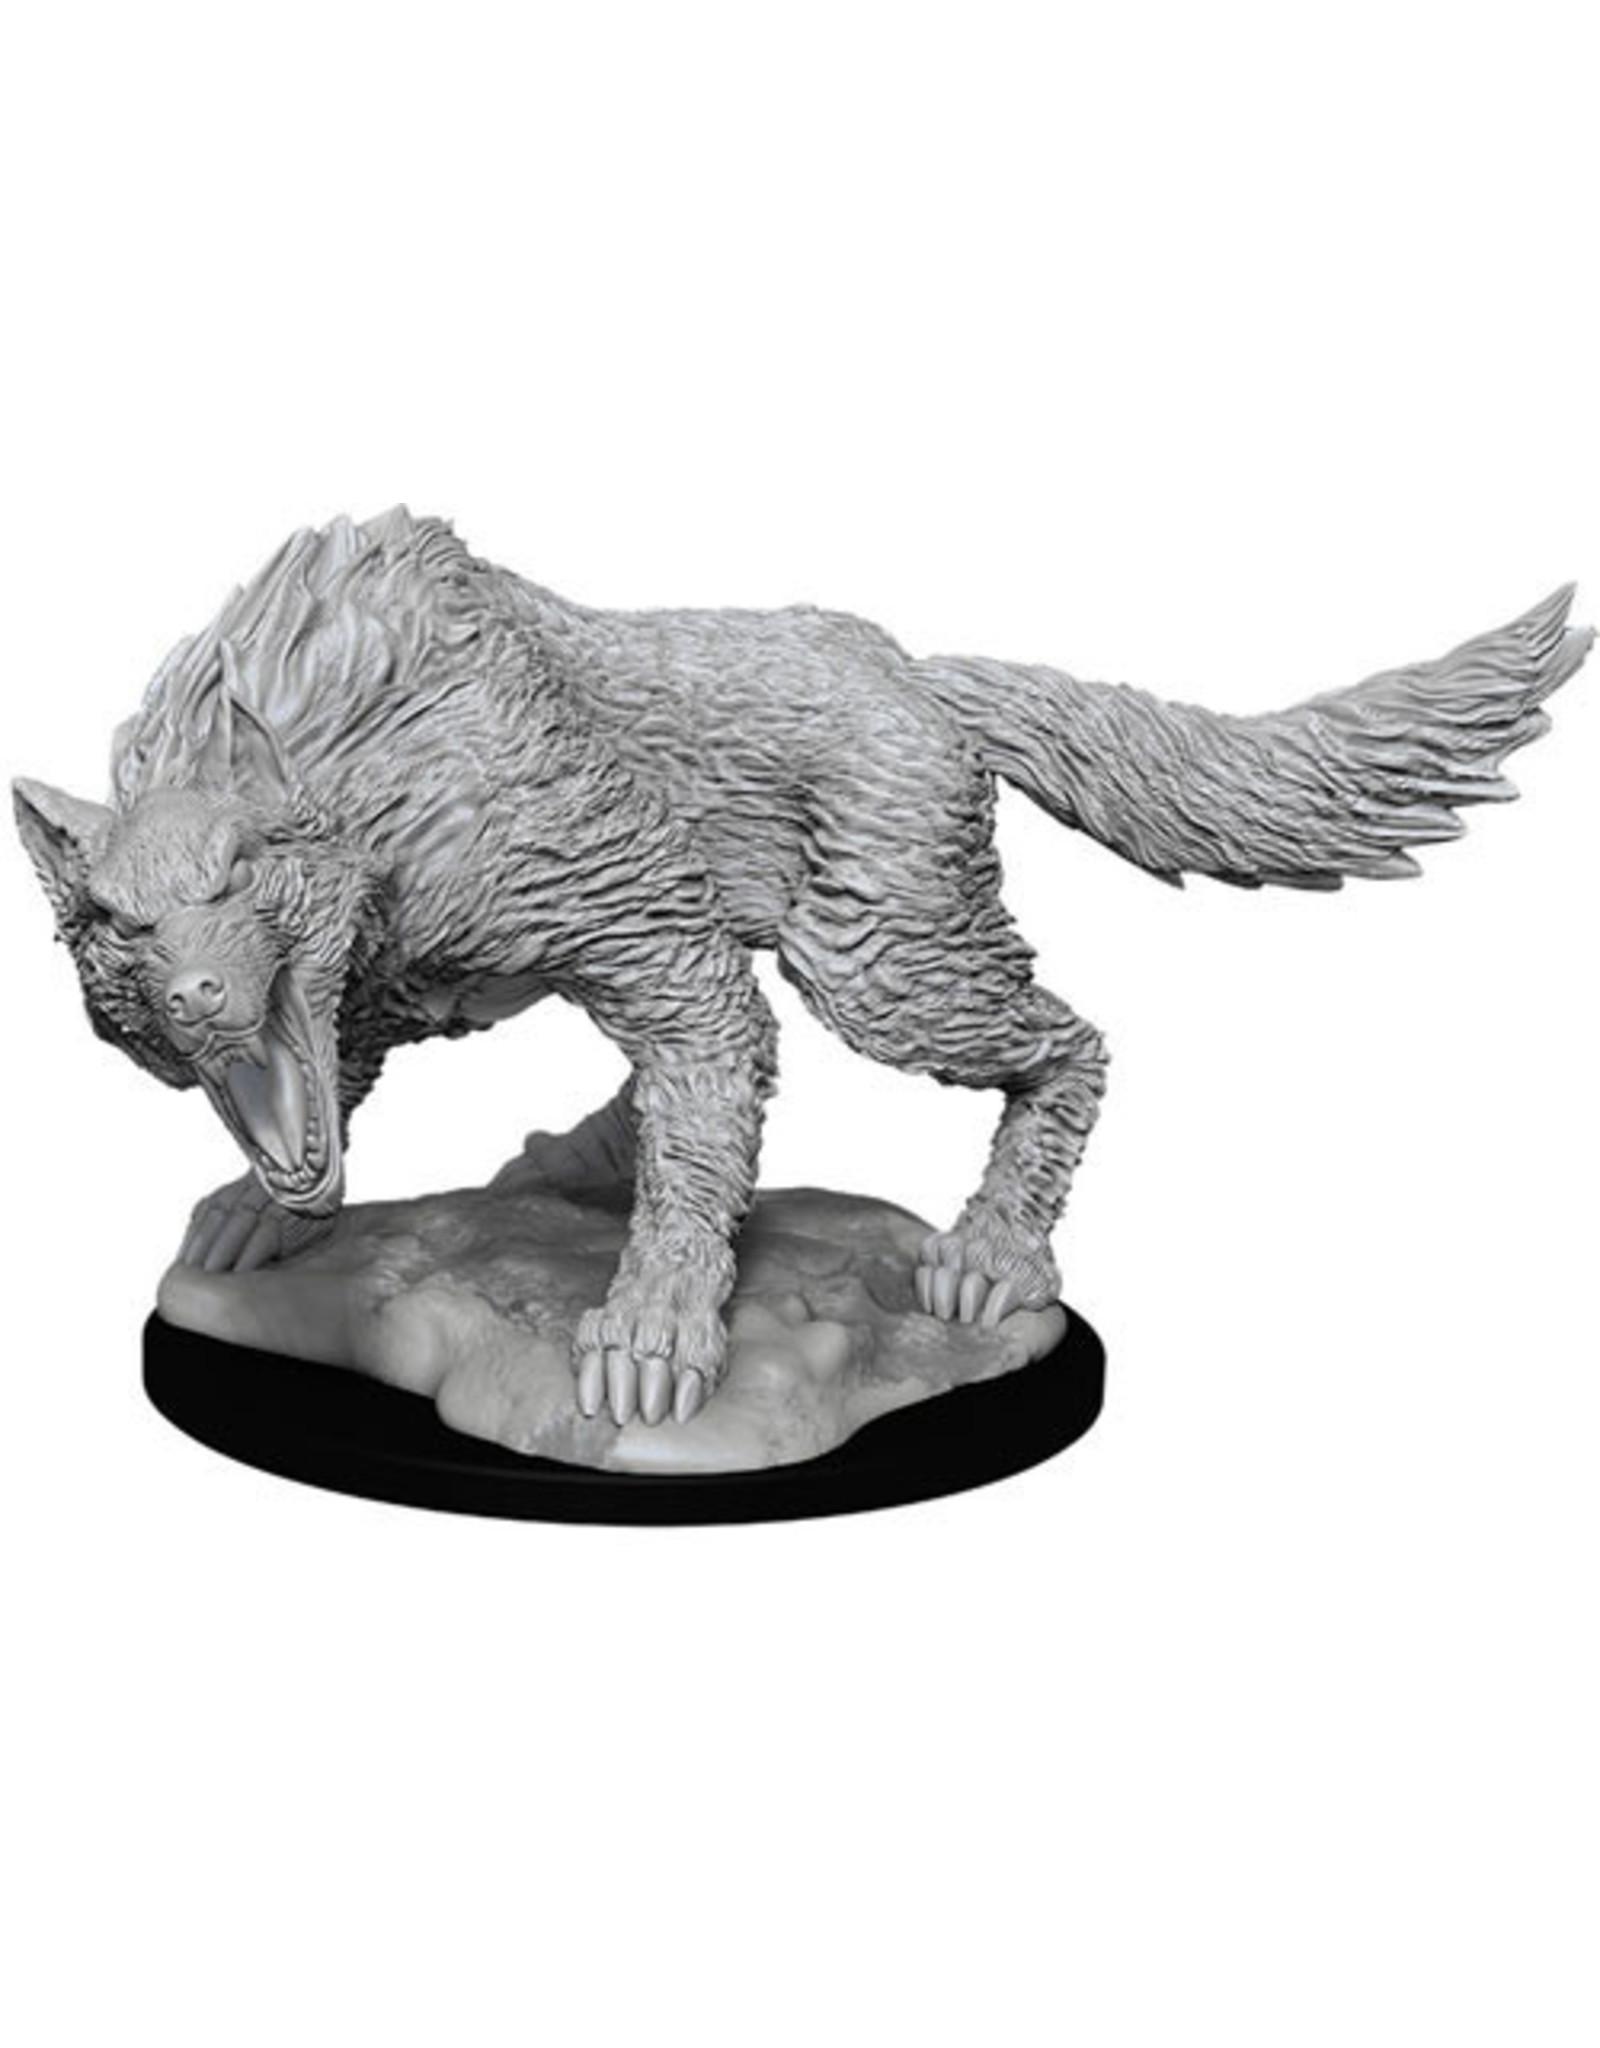 WIZARDS OF THE COAST D&D NOLZURS MARVELOUS WINTER WOLF